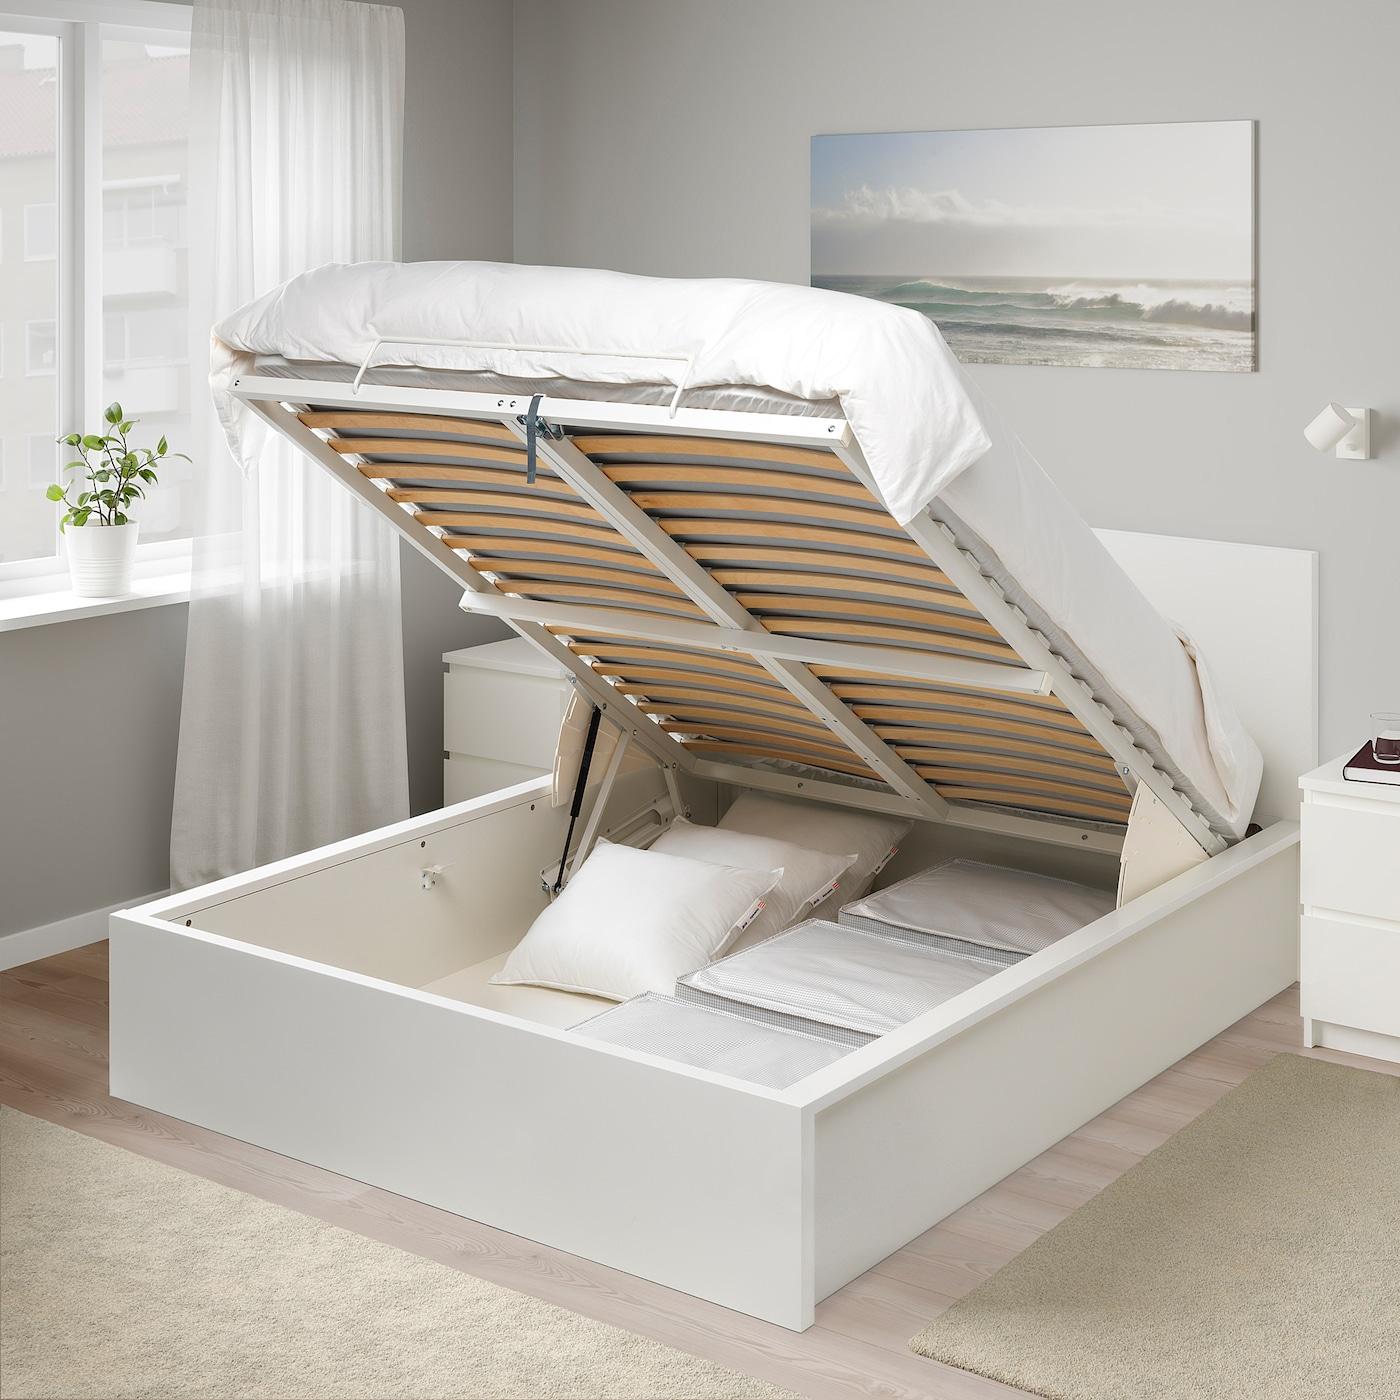 MALM Ottoman bed - white 3x3 cm